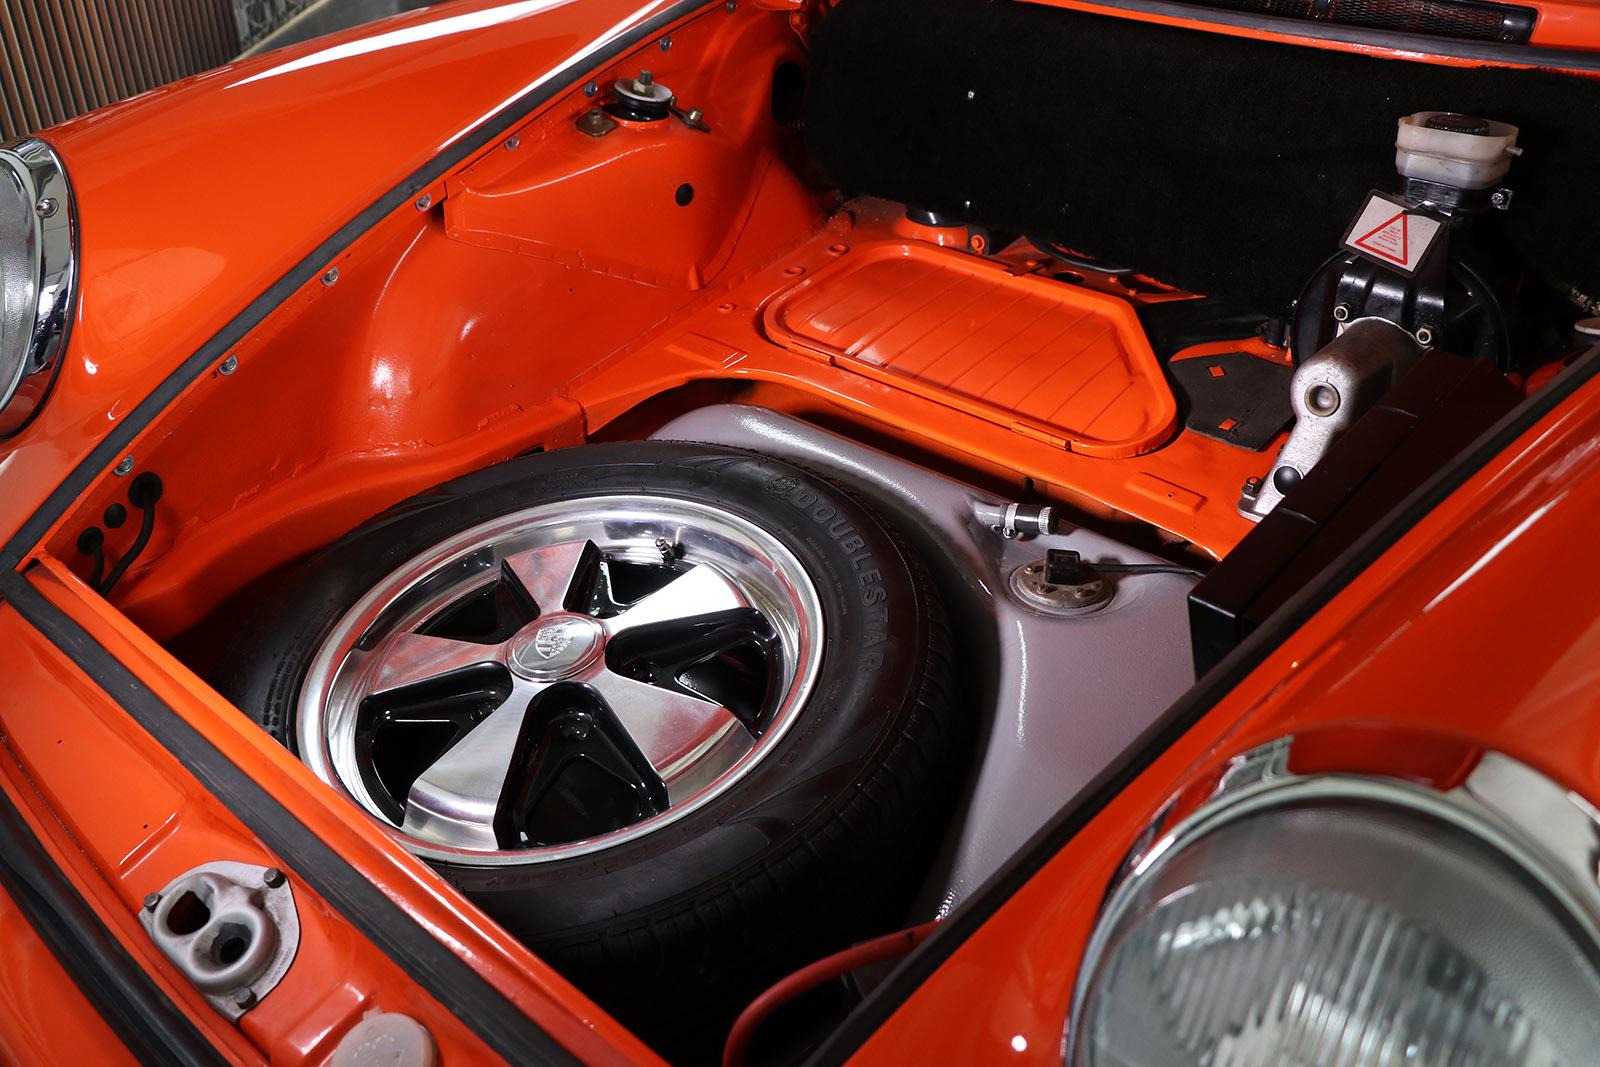 1972-Porsche 911 S-orange-evocation-sayer selection-10-web.jpg